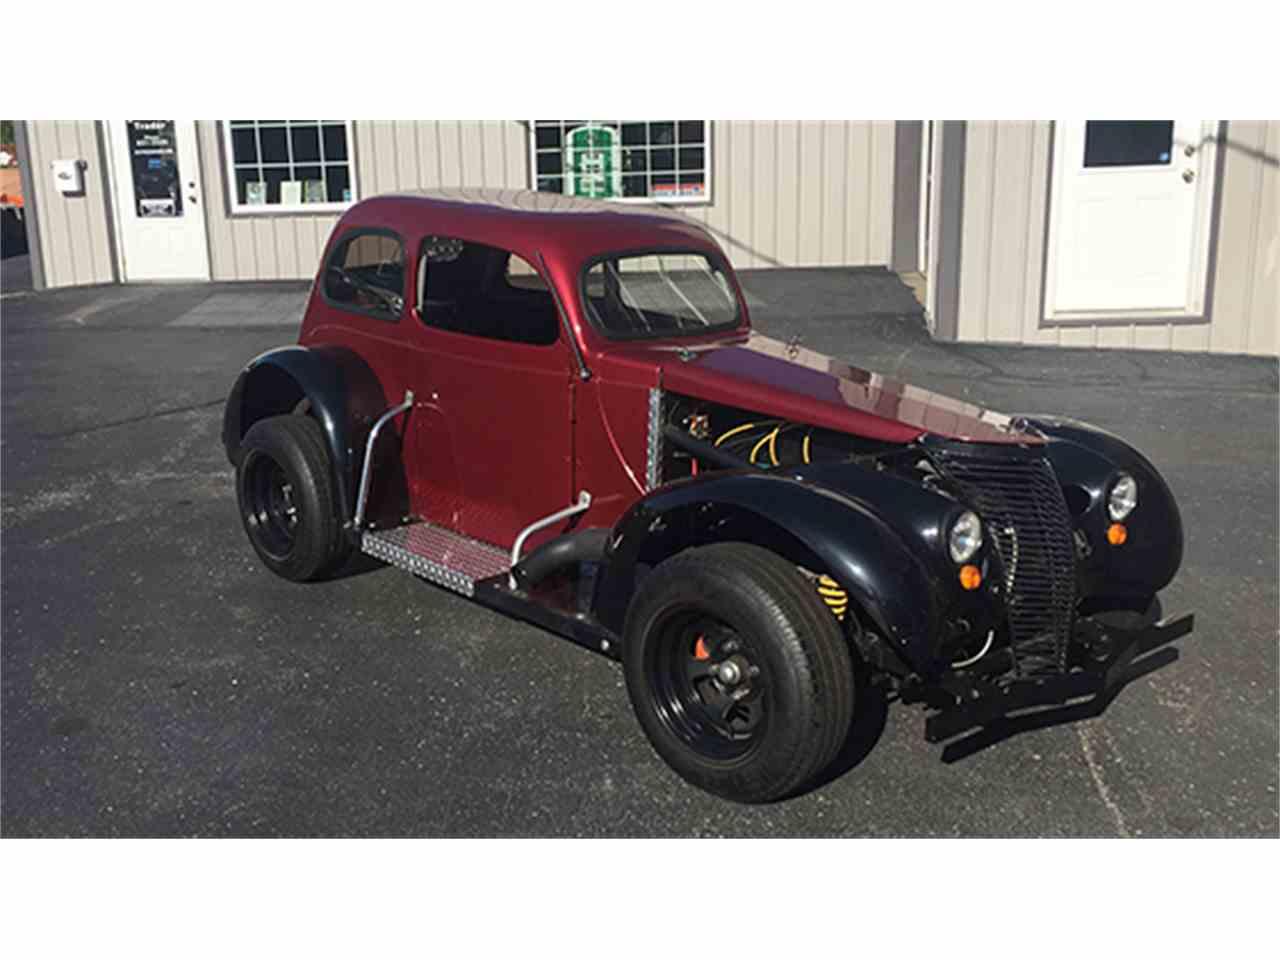 1937 Ford Legends Street Legal Race Car for Sale   ClassicCars.com ...